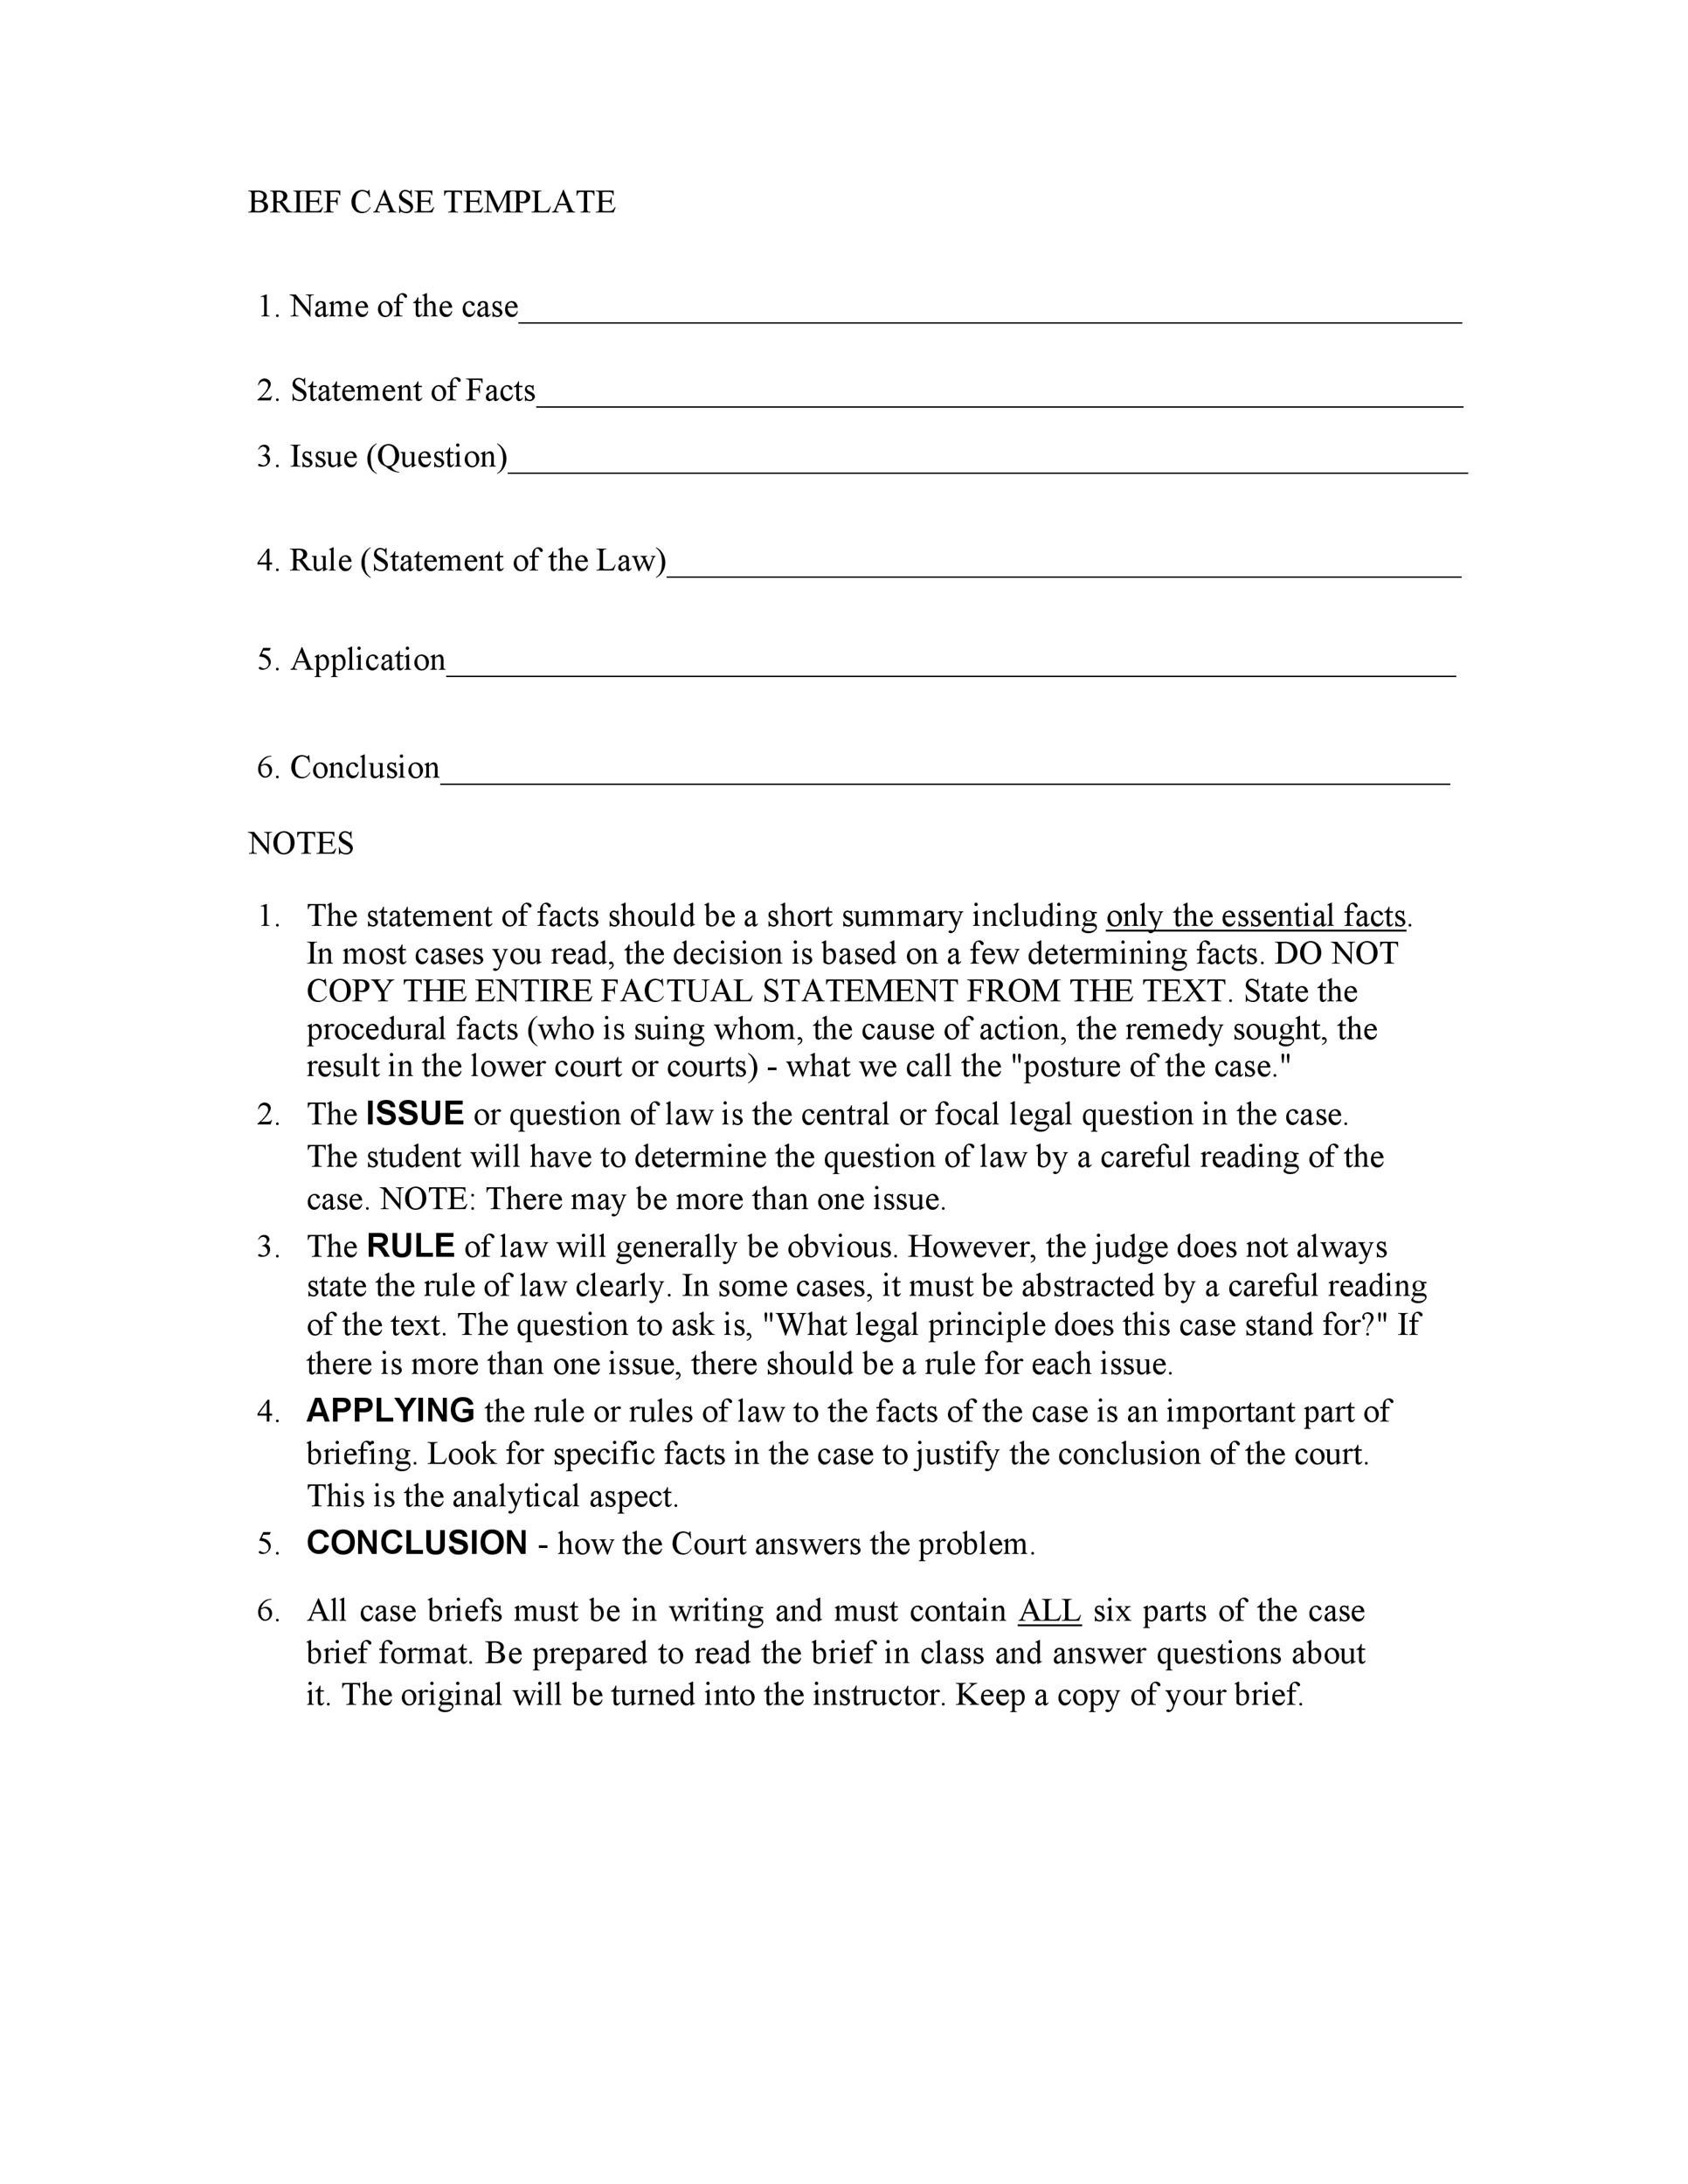 Free case brief template 36